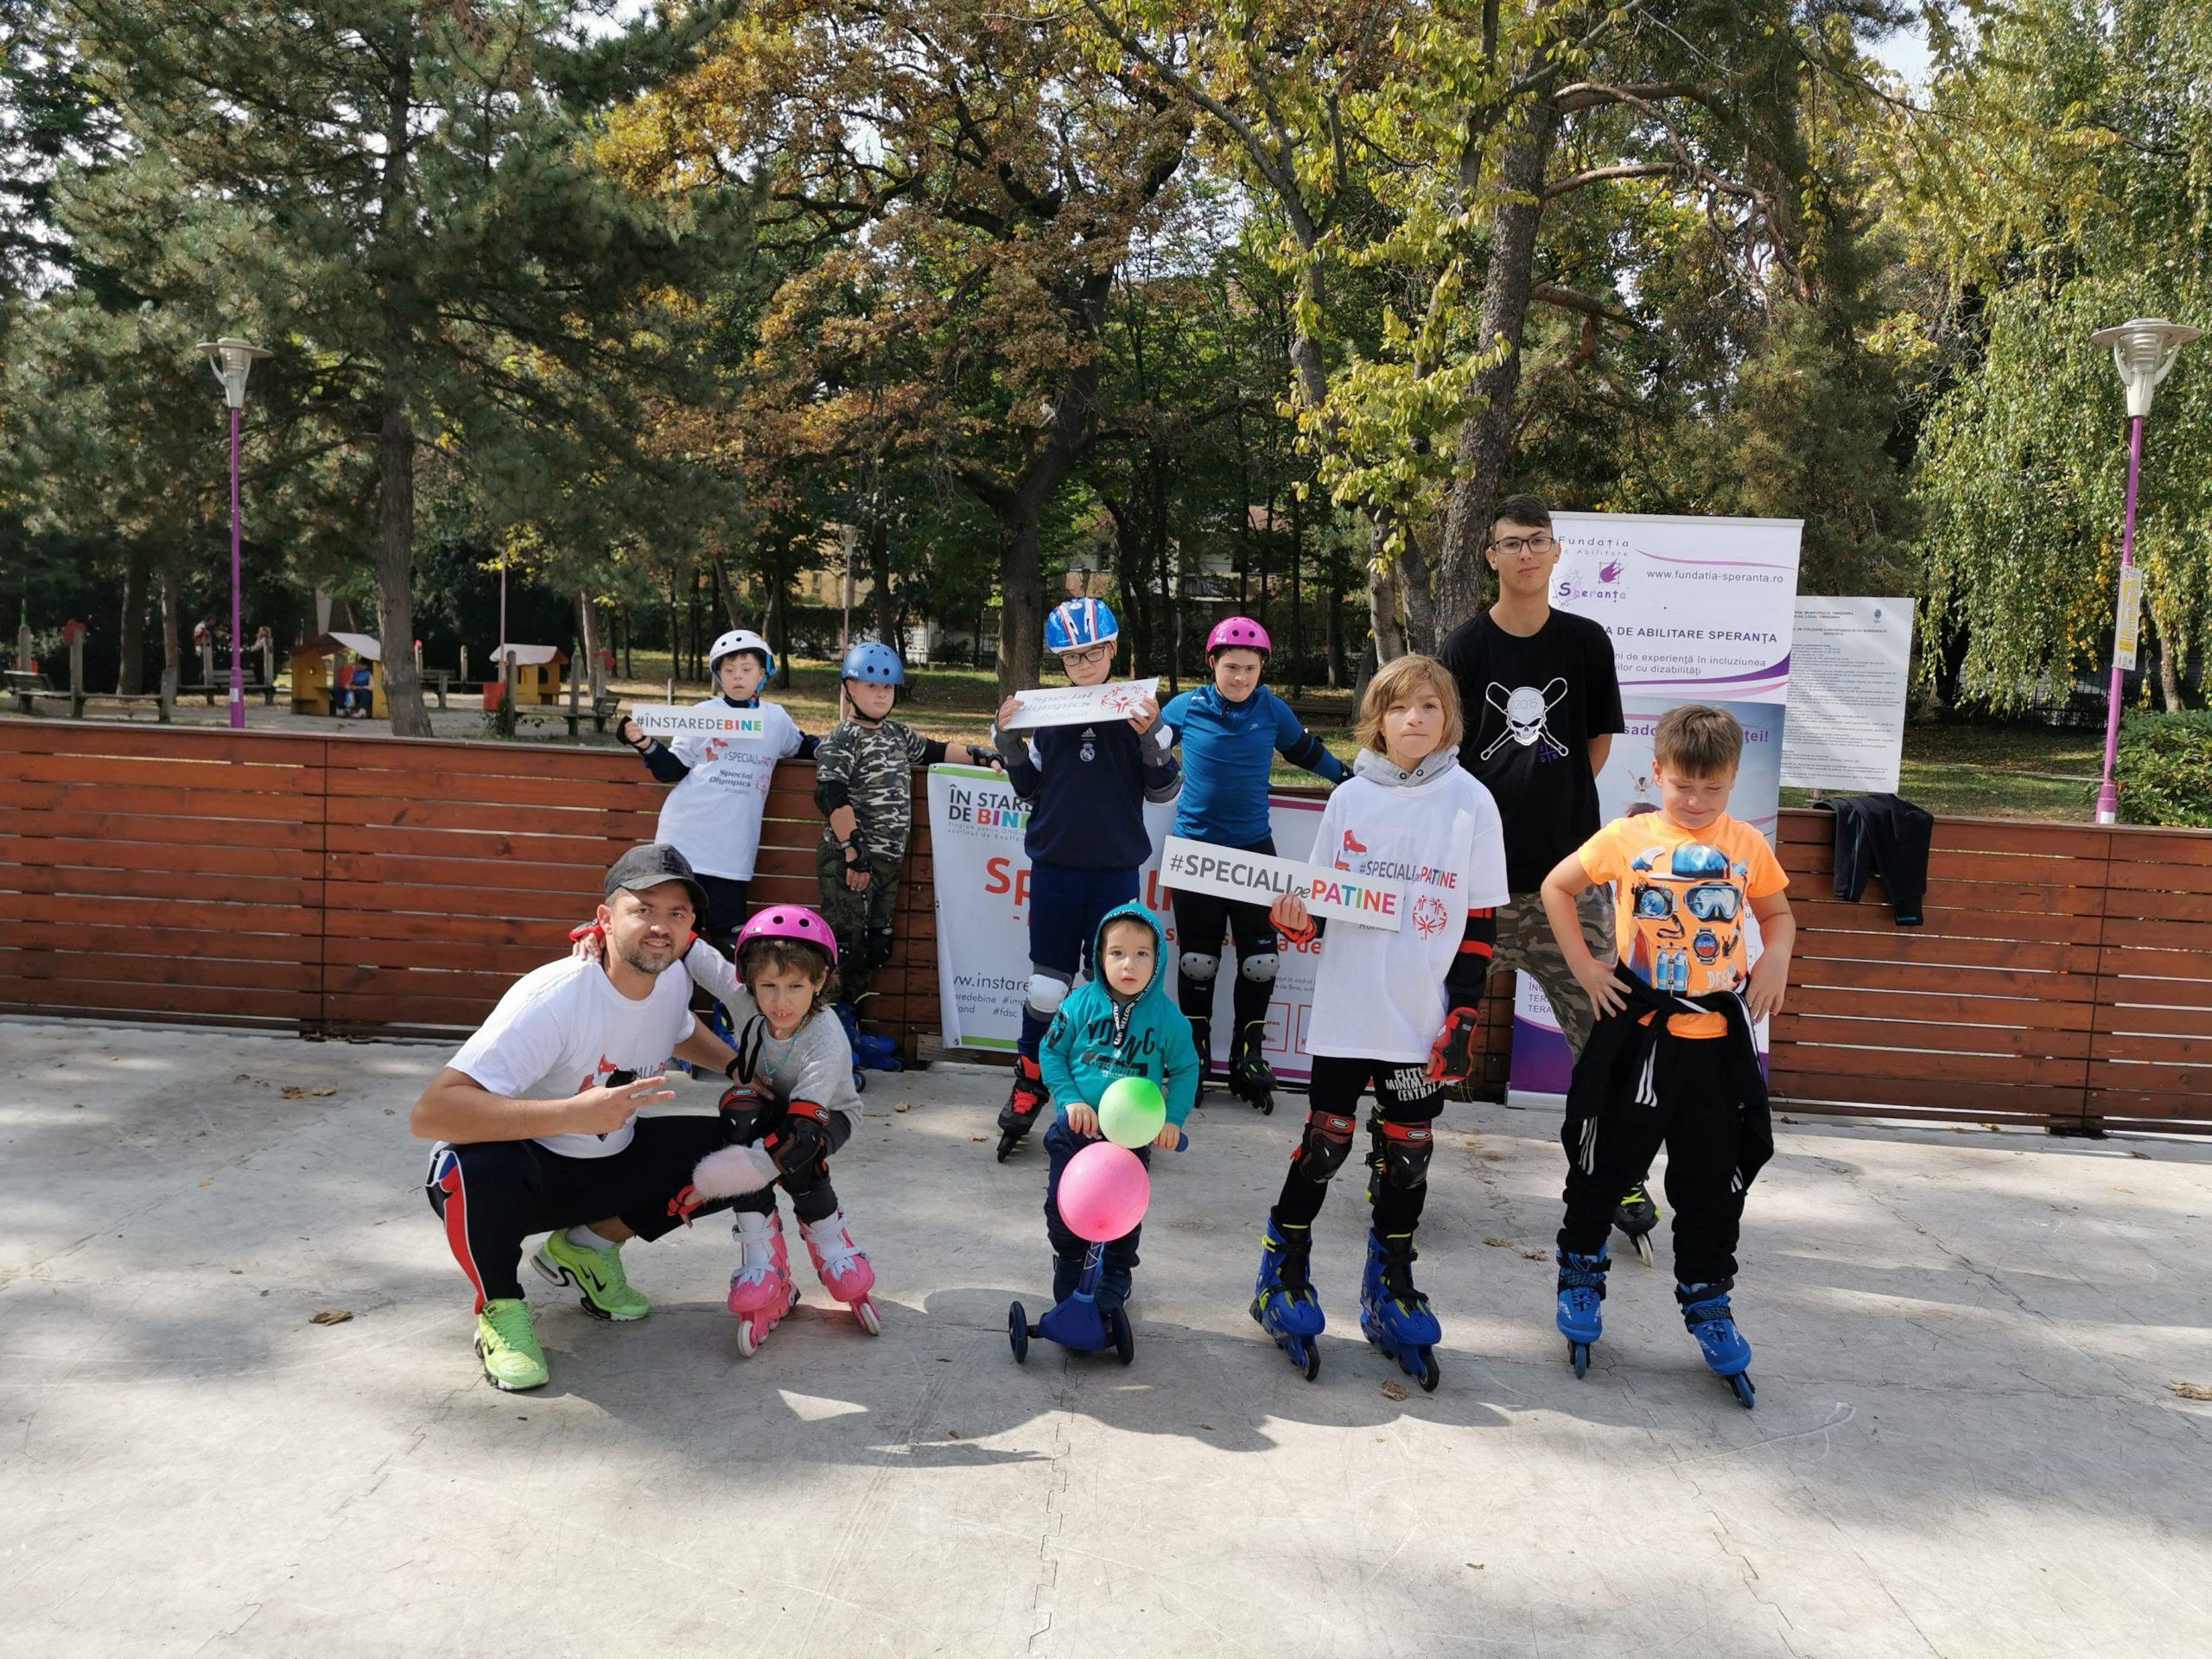 Speciali pe patine, Special Olympics, Timisoara (4)